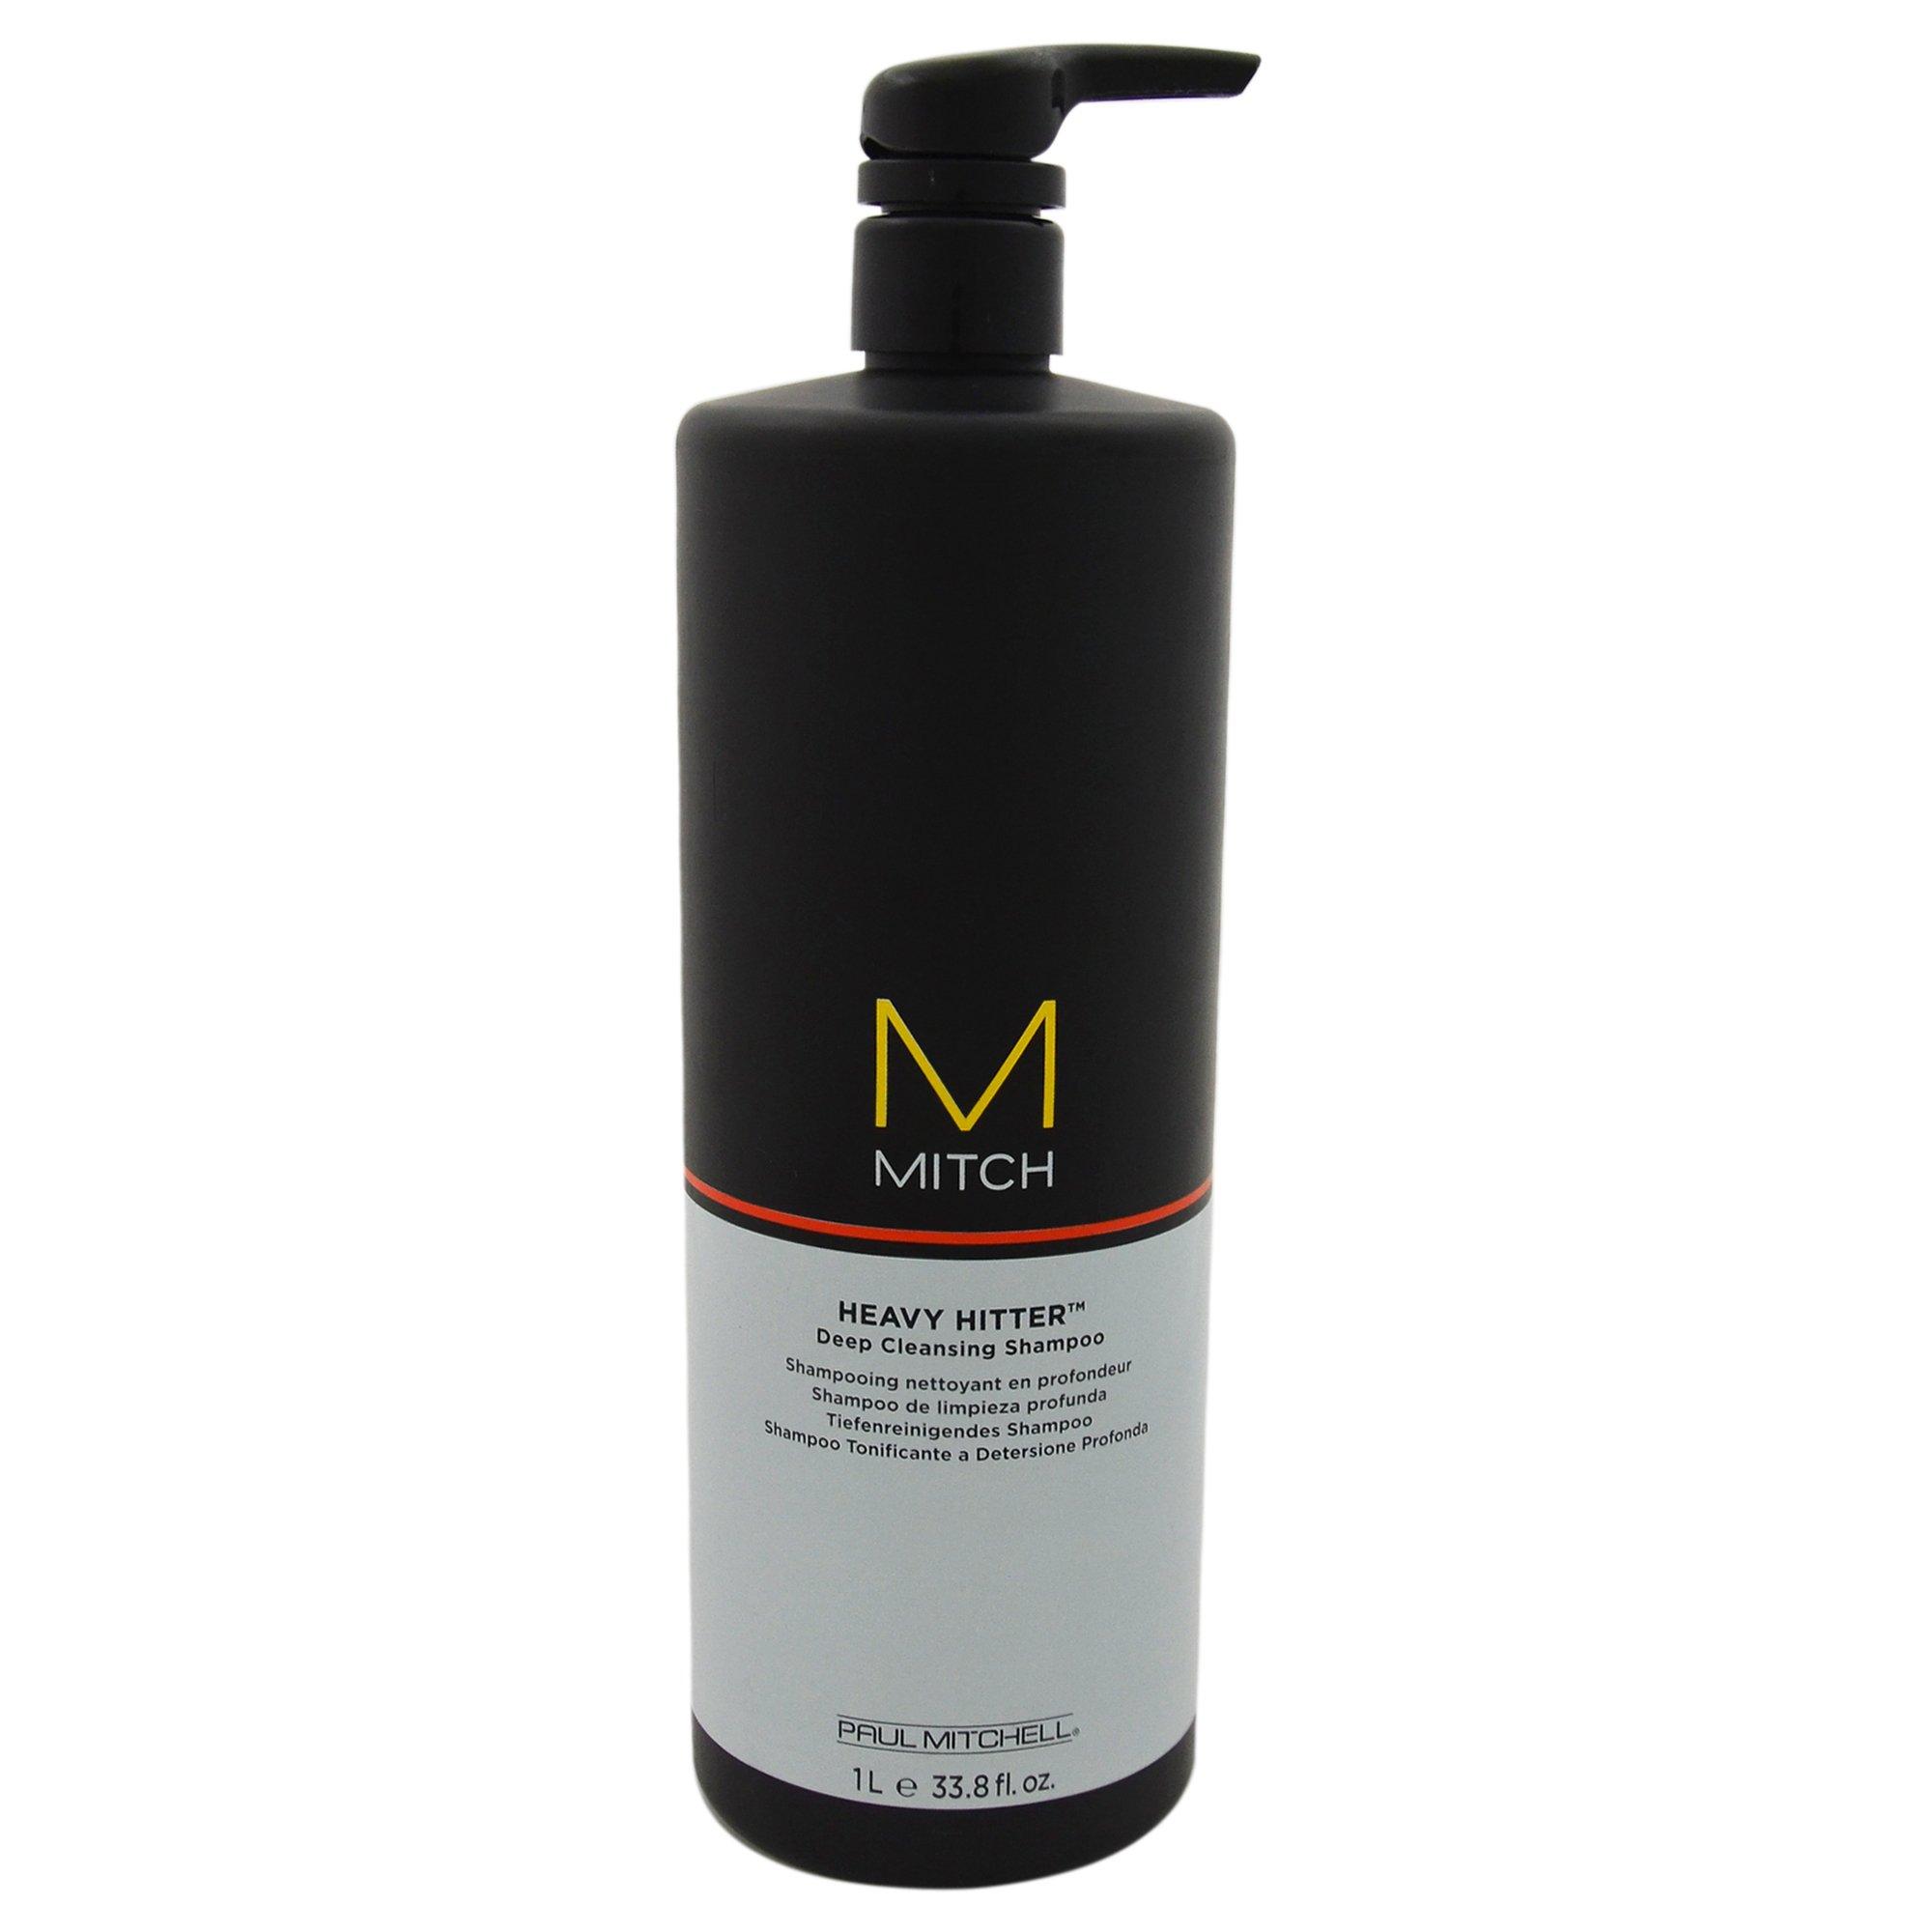 Mitch Matterial >> Amazon.com: Paul Mitchell Matterial Strong Hold Ultra Matte Styling Clay, 3 oz: Beauty